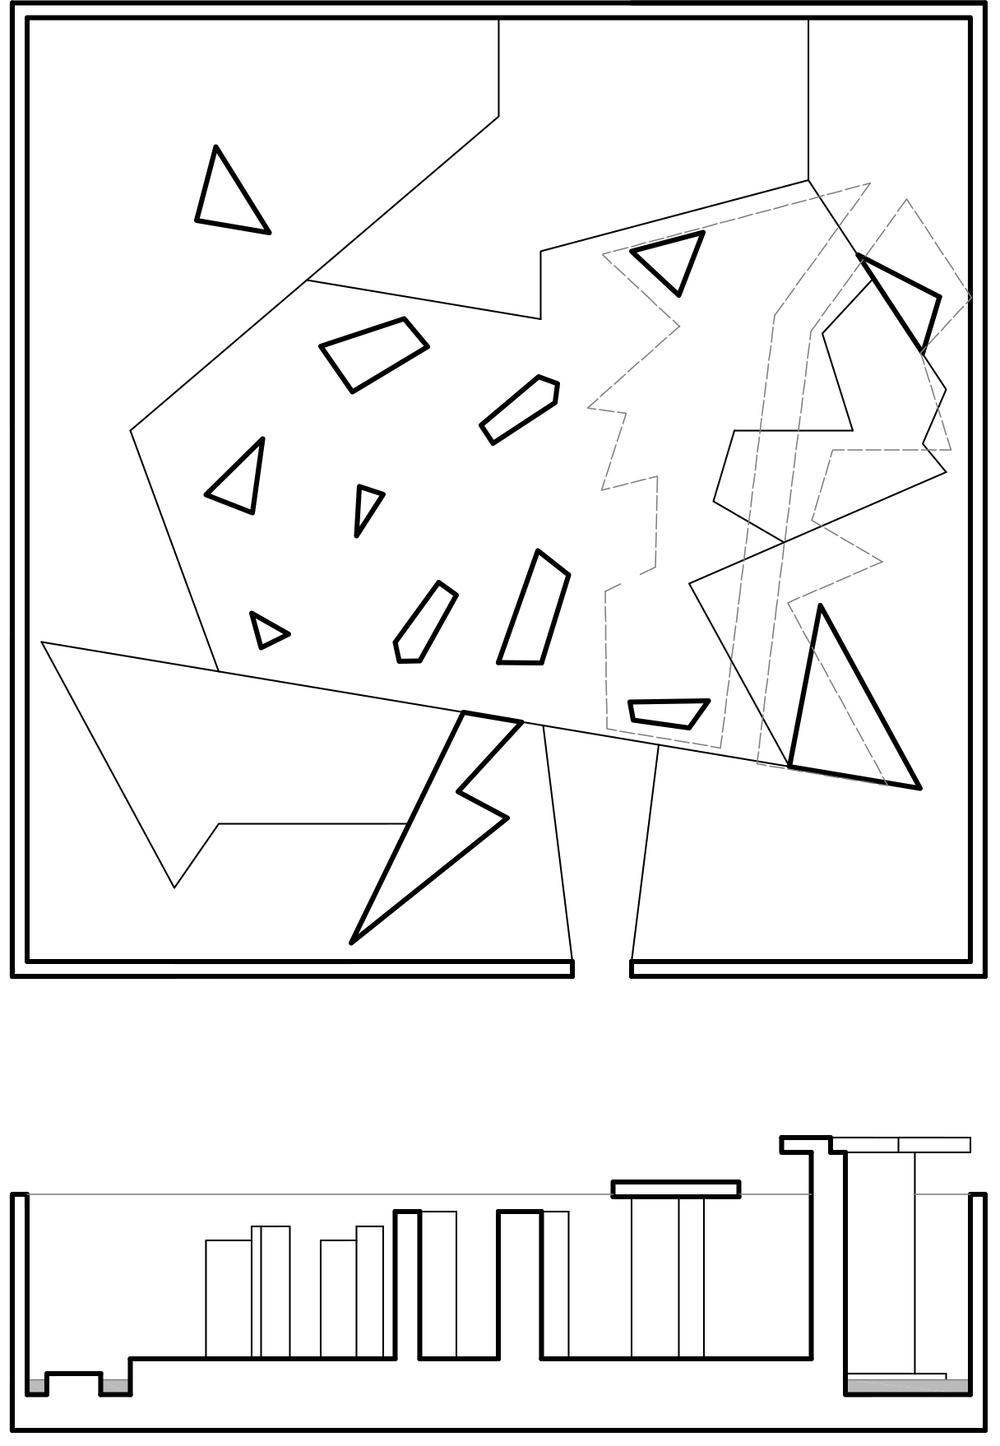 DiomedisUrbaez_170_1.jpg